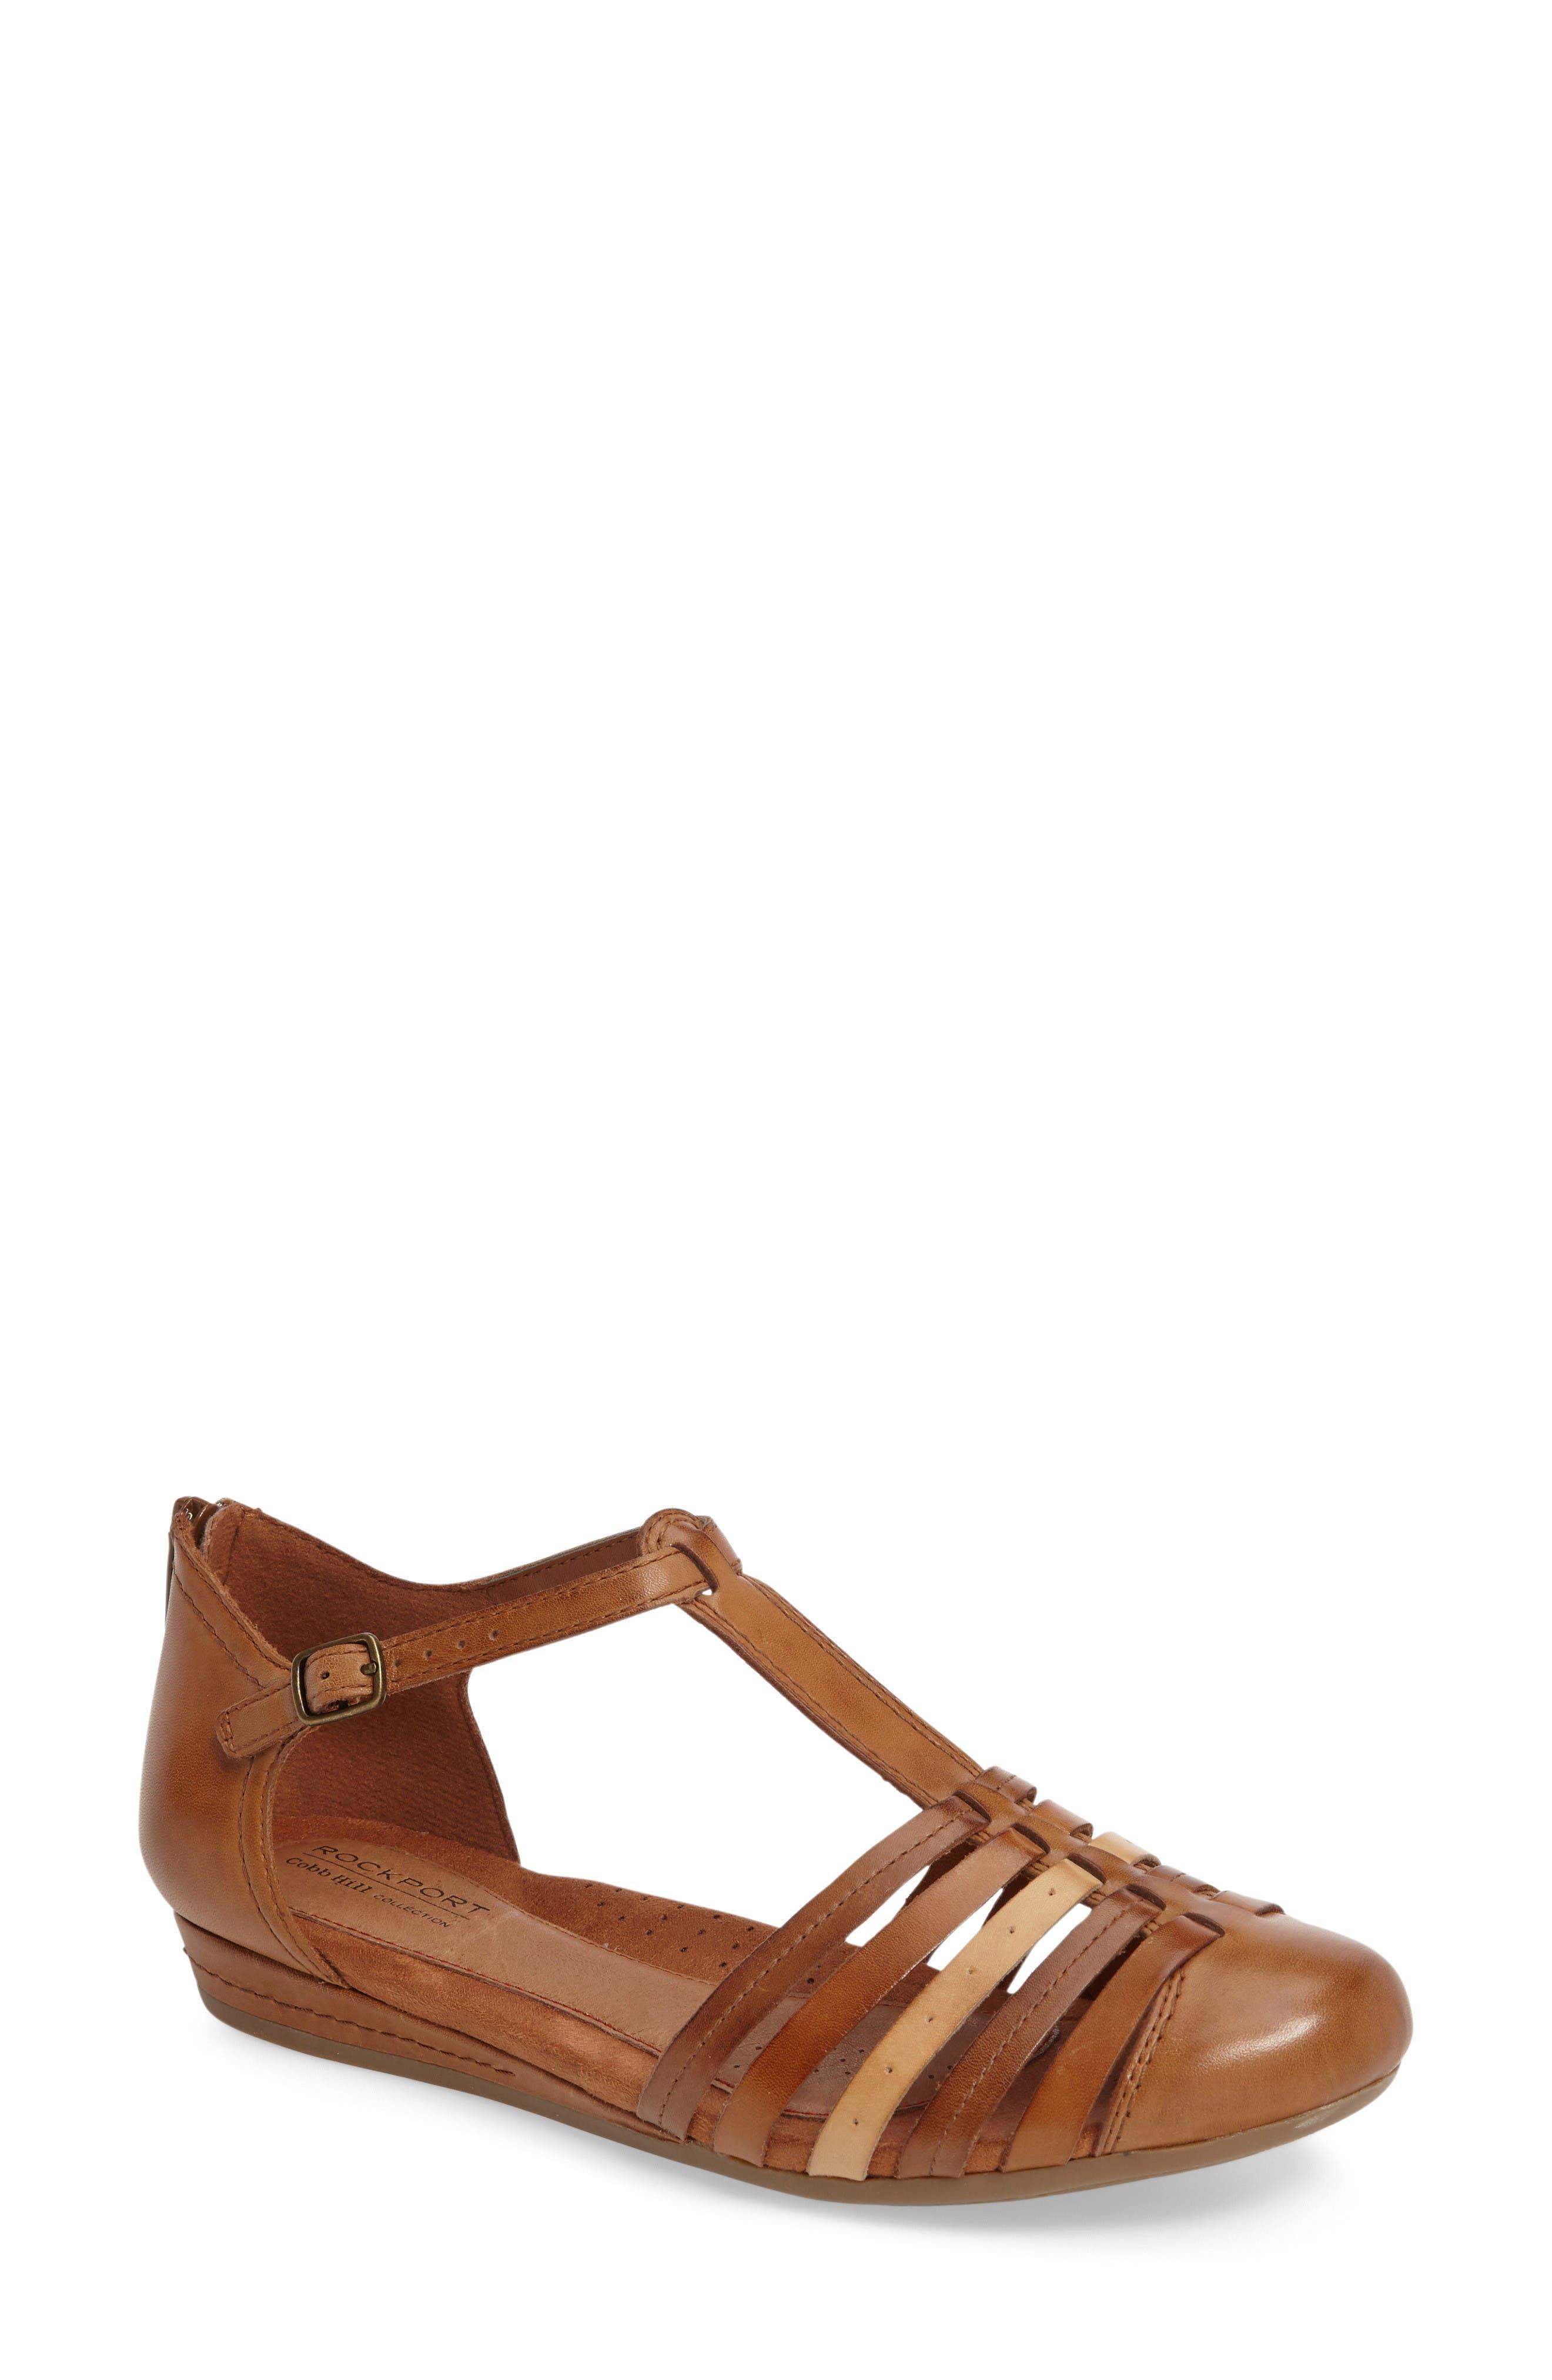 Alternate Image 1 Selected - Rockport Cobb Hill Galway T-Strap Sandal (Women)